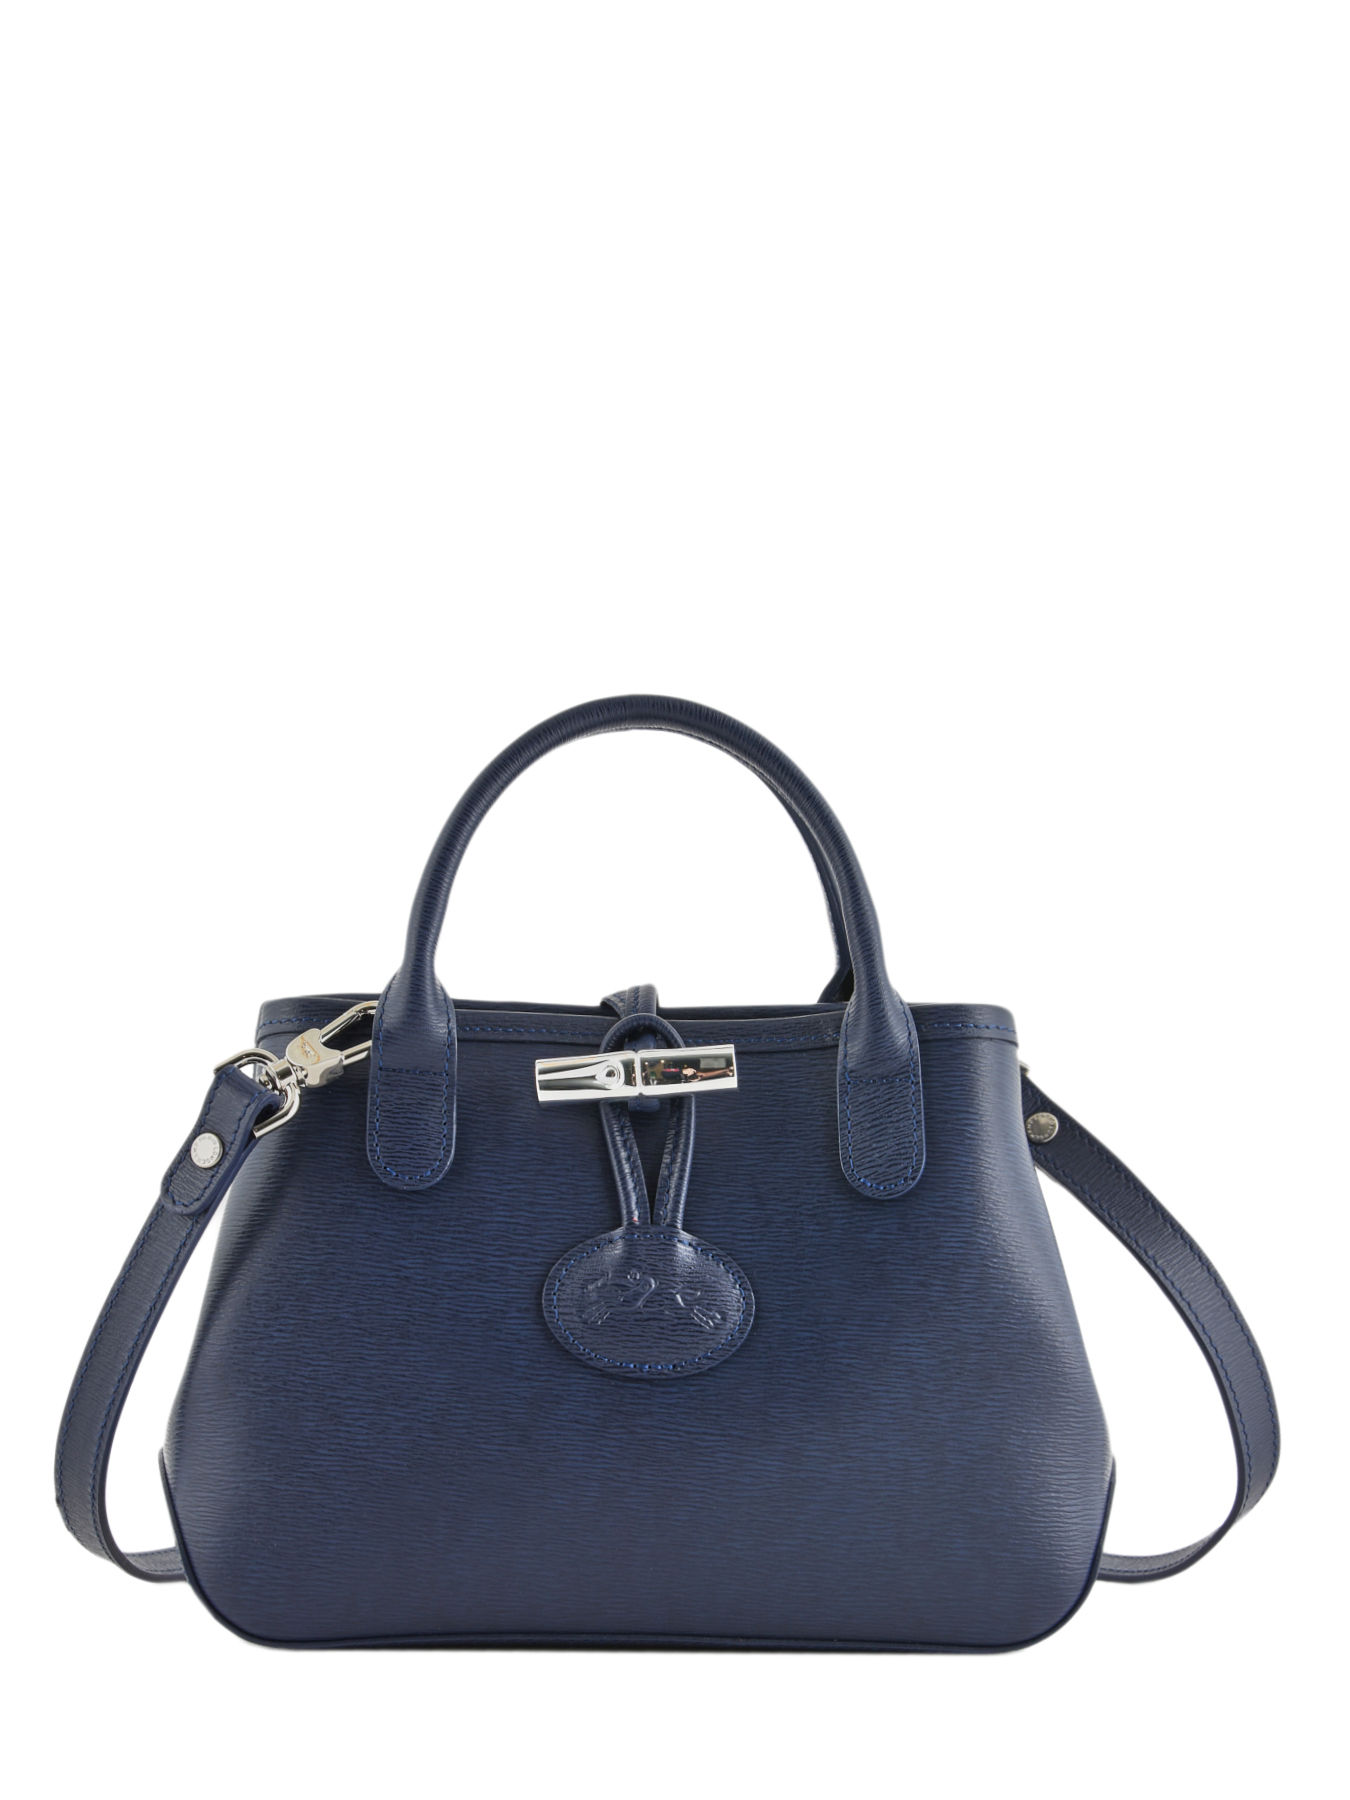 b57ef77e5f Longchamp Messenger bag 1016871 - best prices